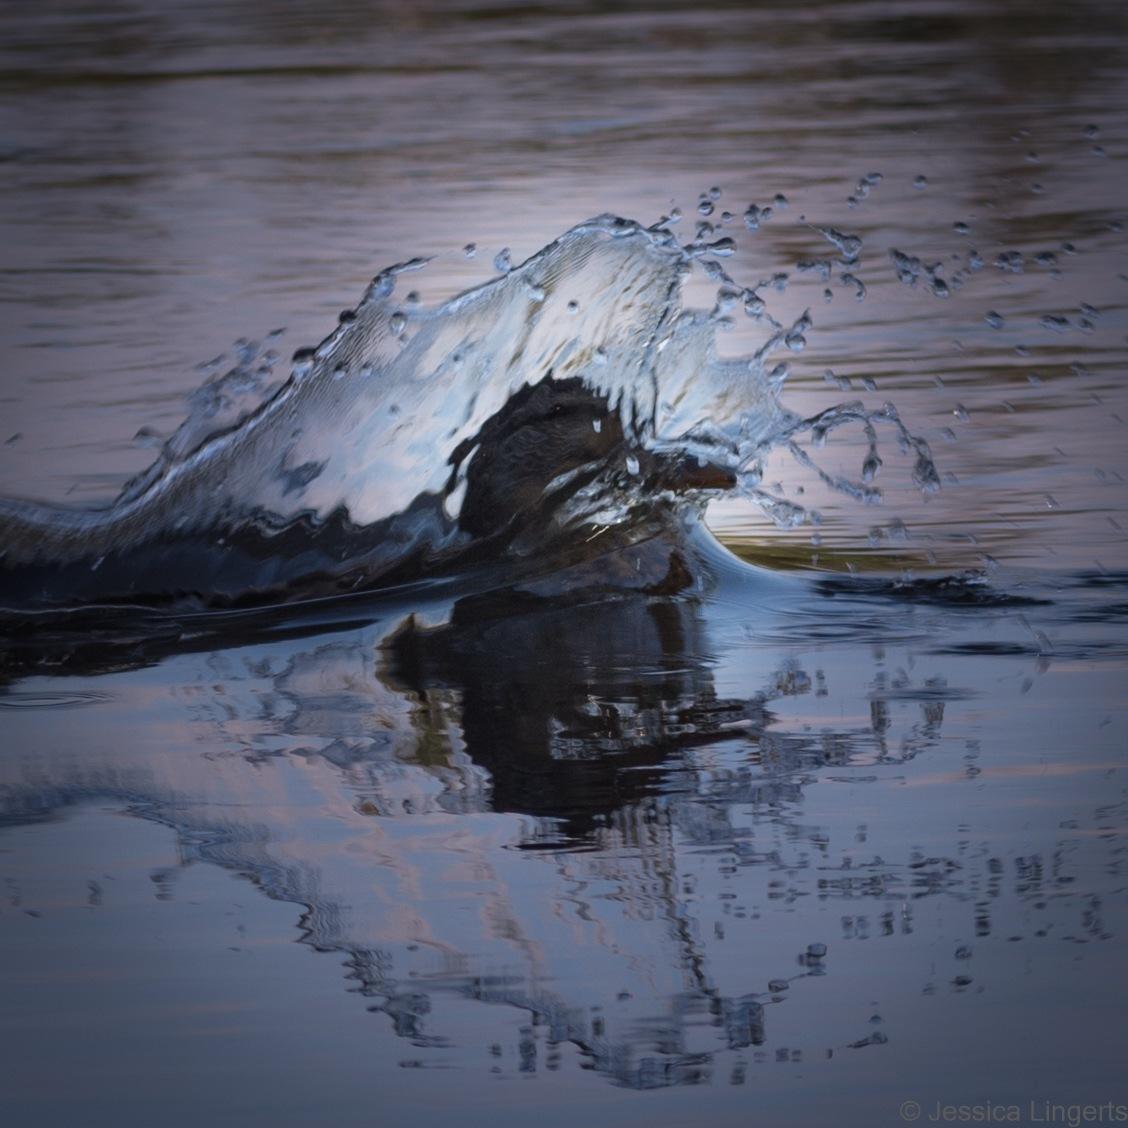 Splash by Jessica Lingerts